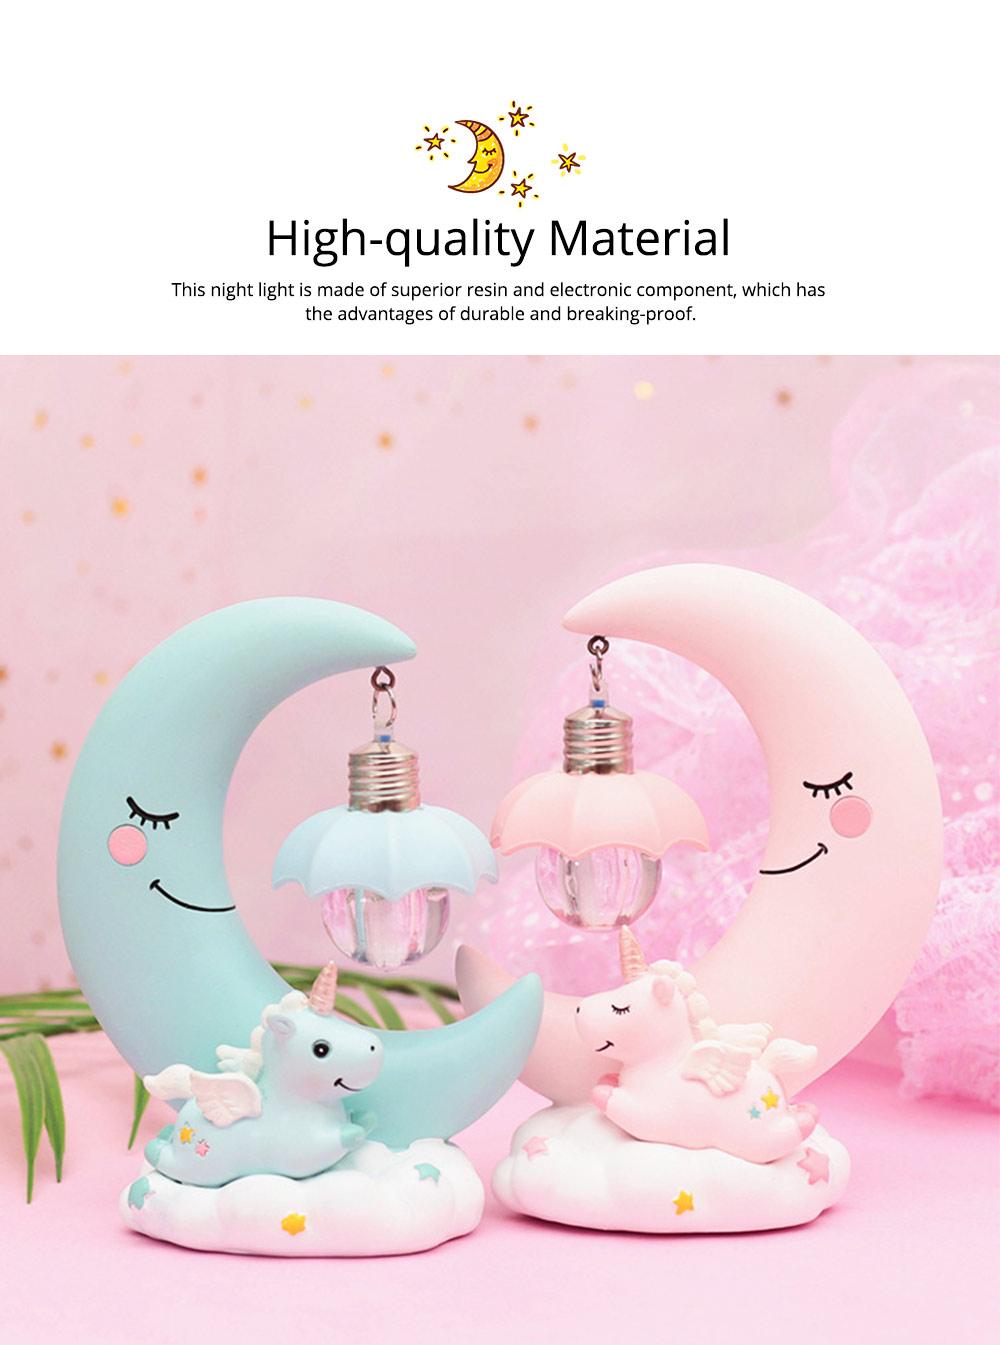 Fancy Unicorn Moon Electronic Night Light, Cute Resin Home Decoration Ornament Tabletop Furnishing 1